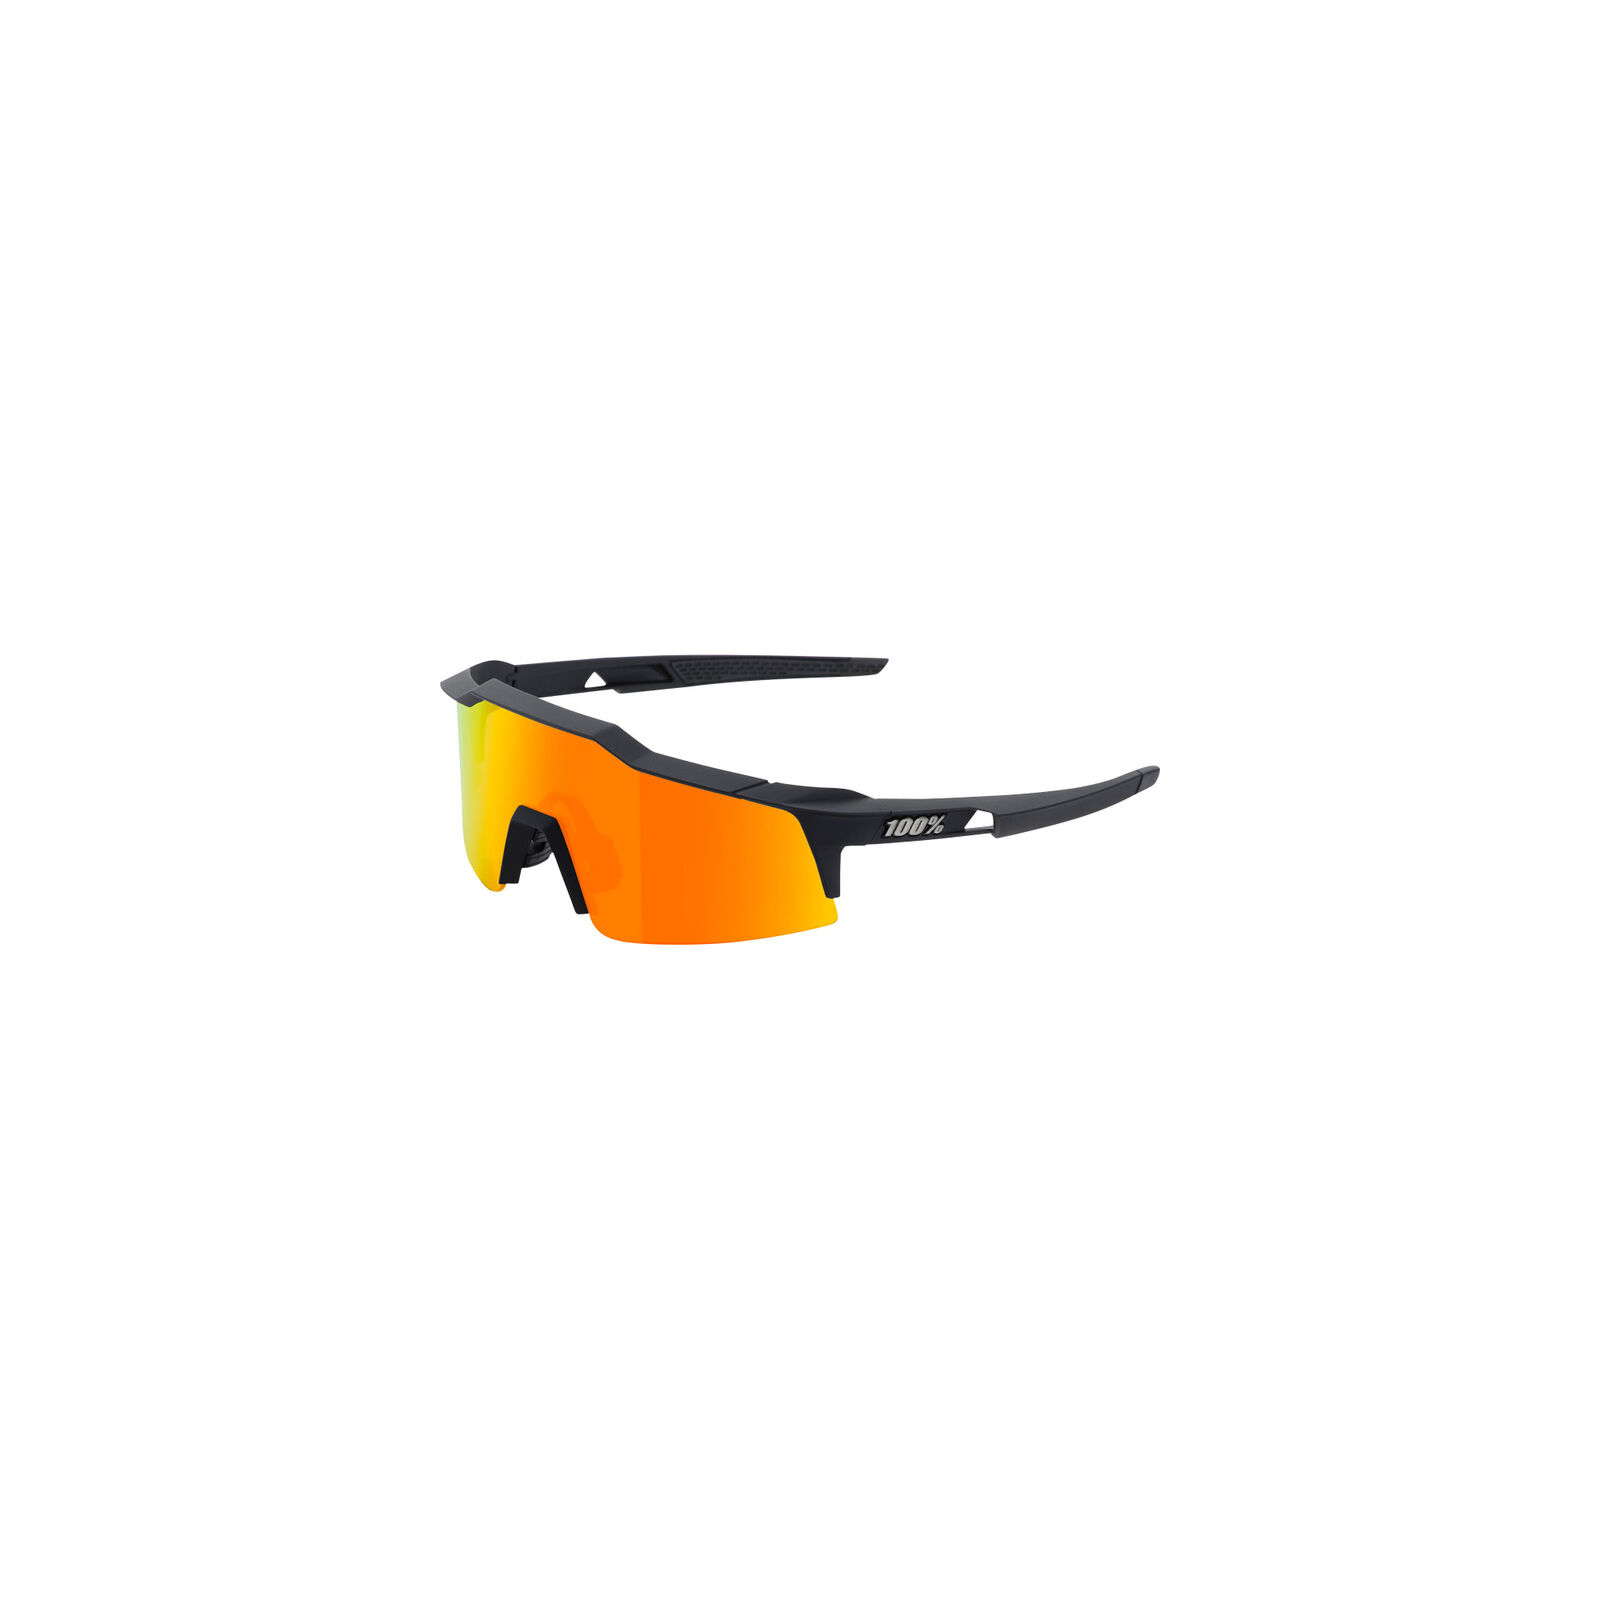 100% Speedcraft SL Gafas de Sol Negro Negro Negro Hiper Rojo Multilayer Lentes Espejados 171a46